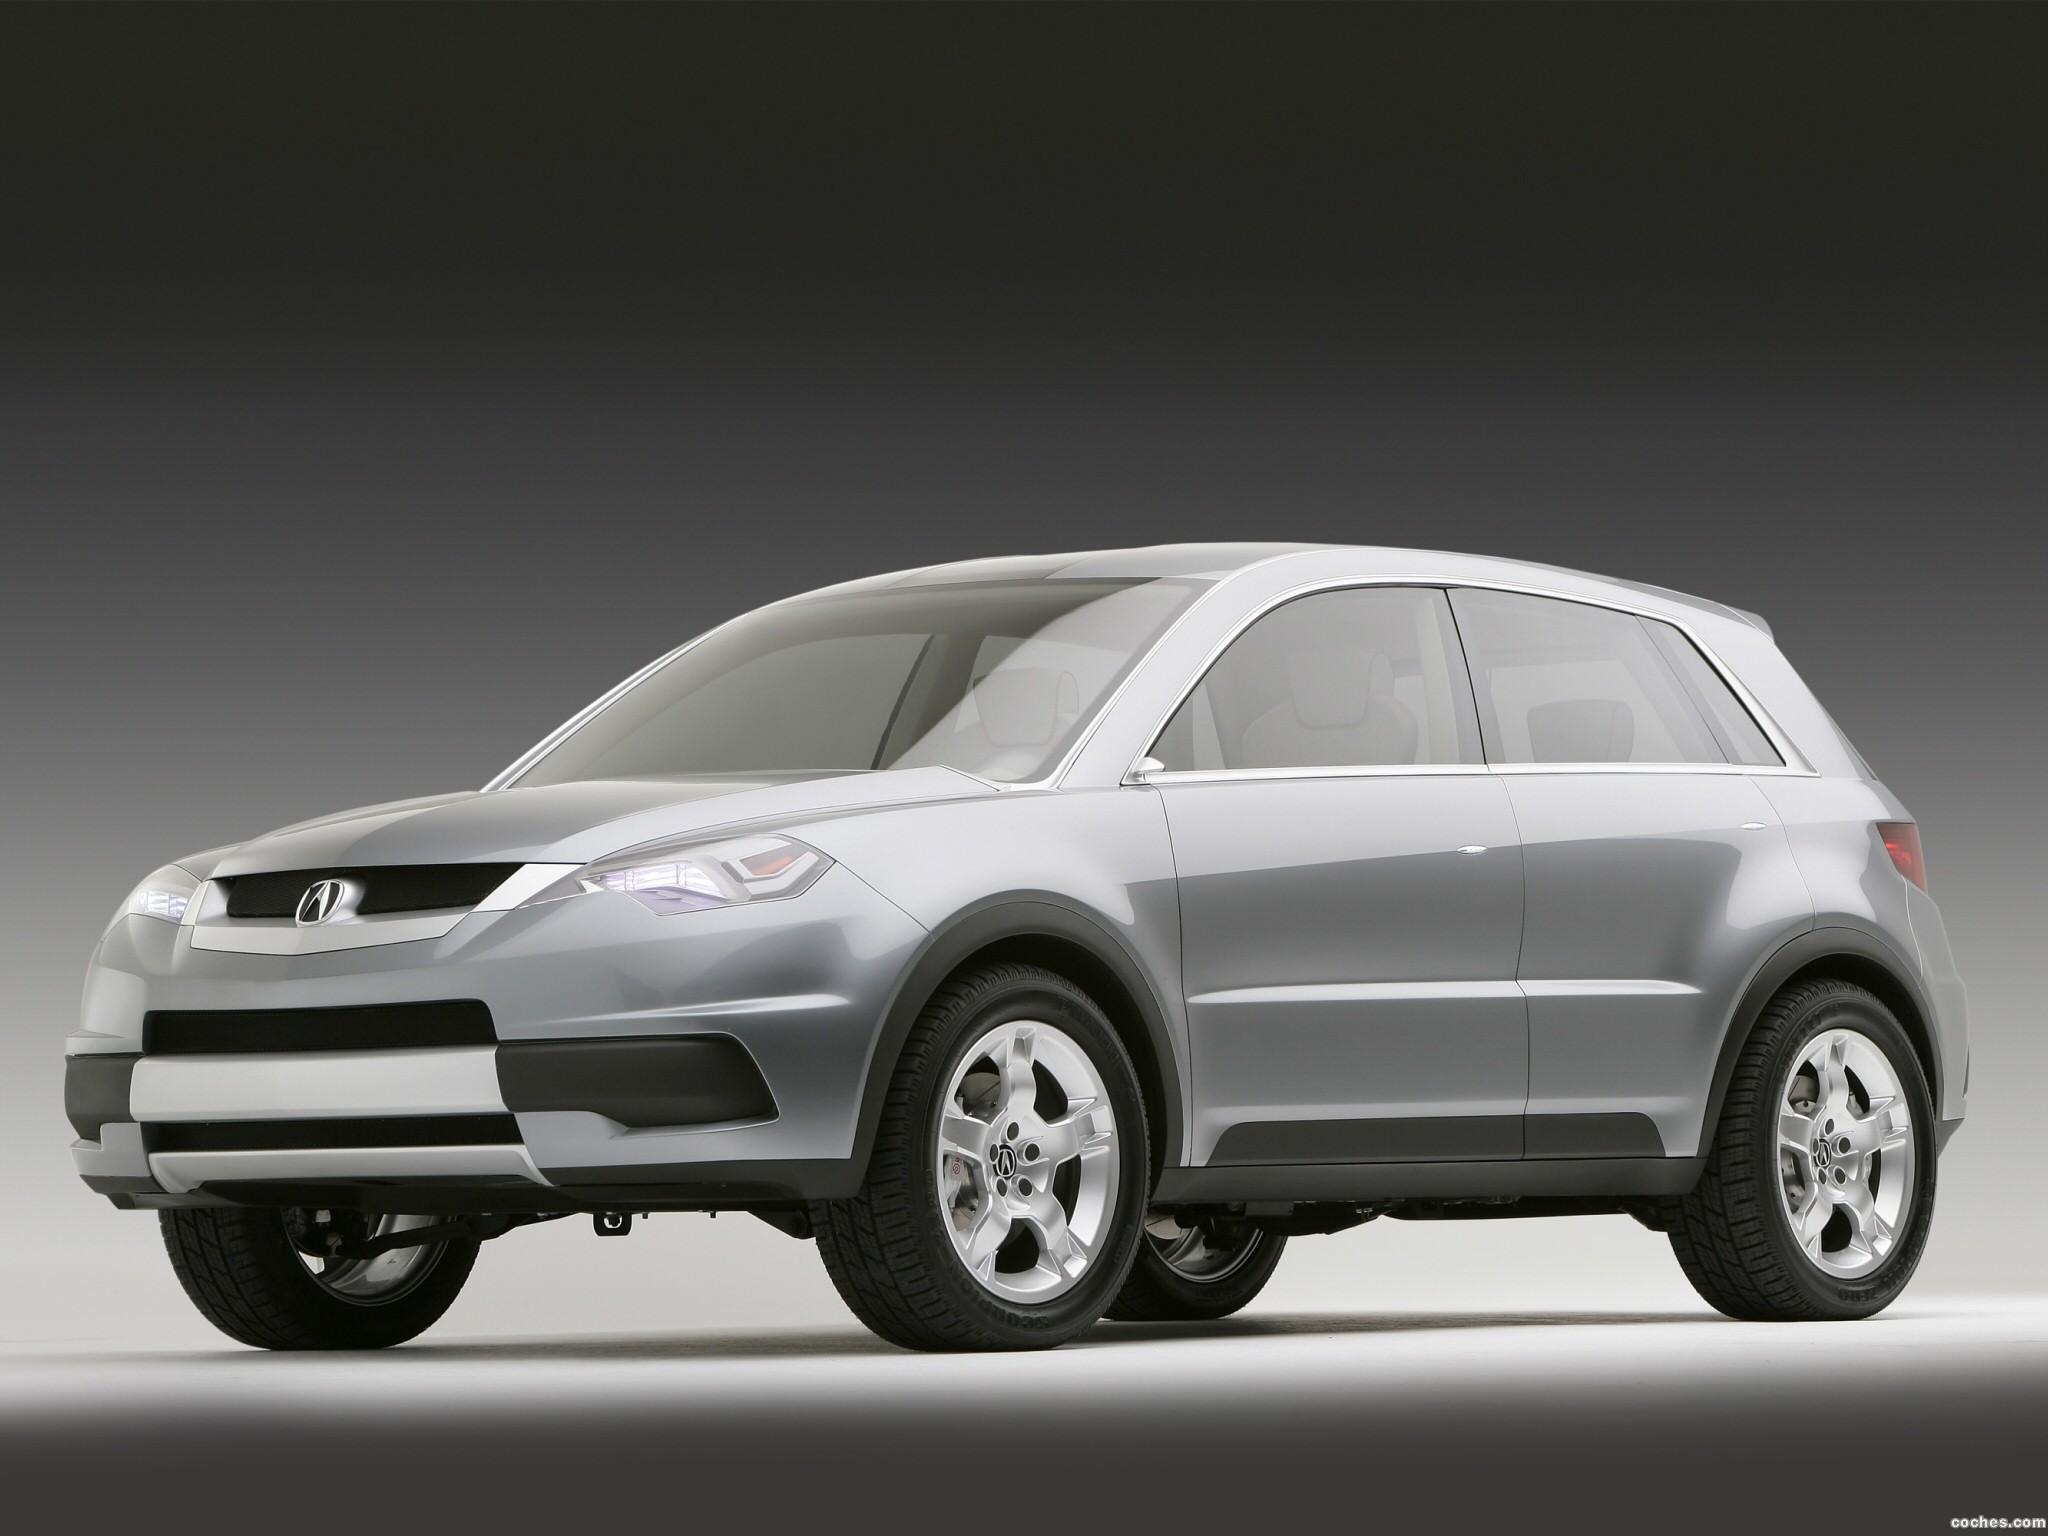 Foto 0 de Acura RDX Concept 2005